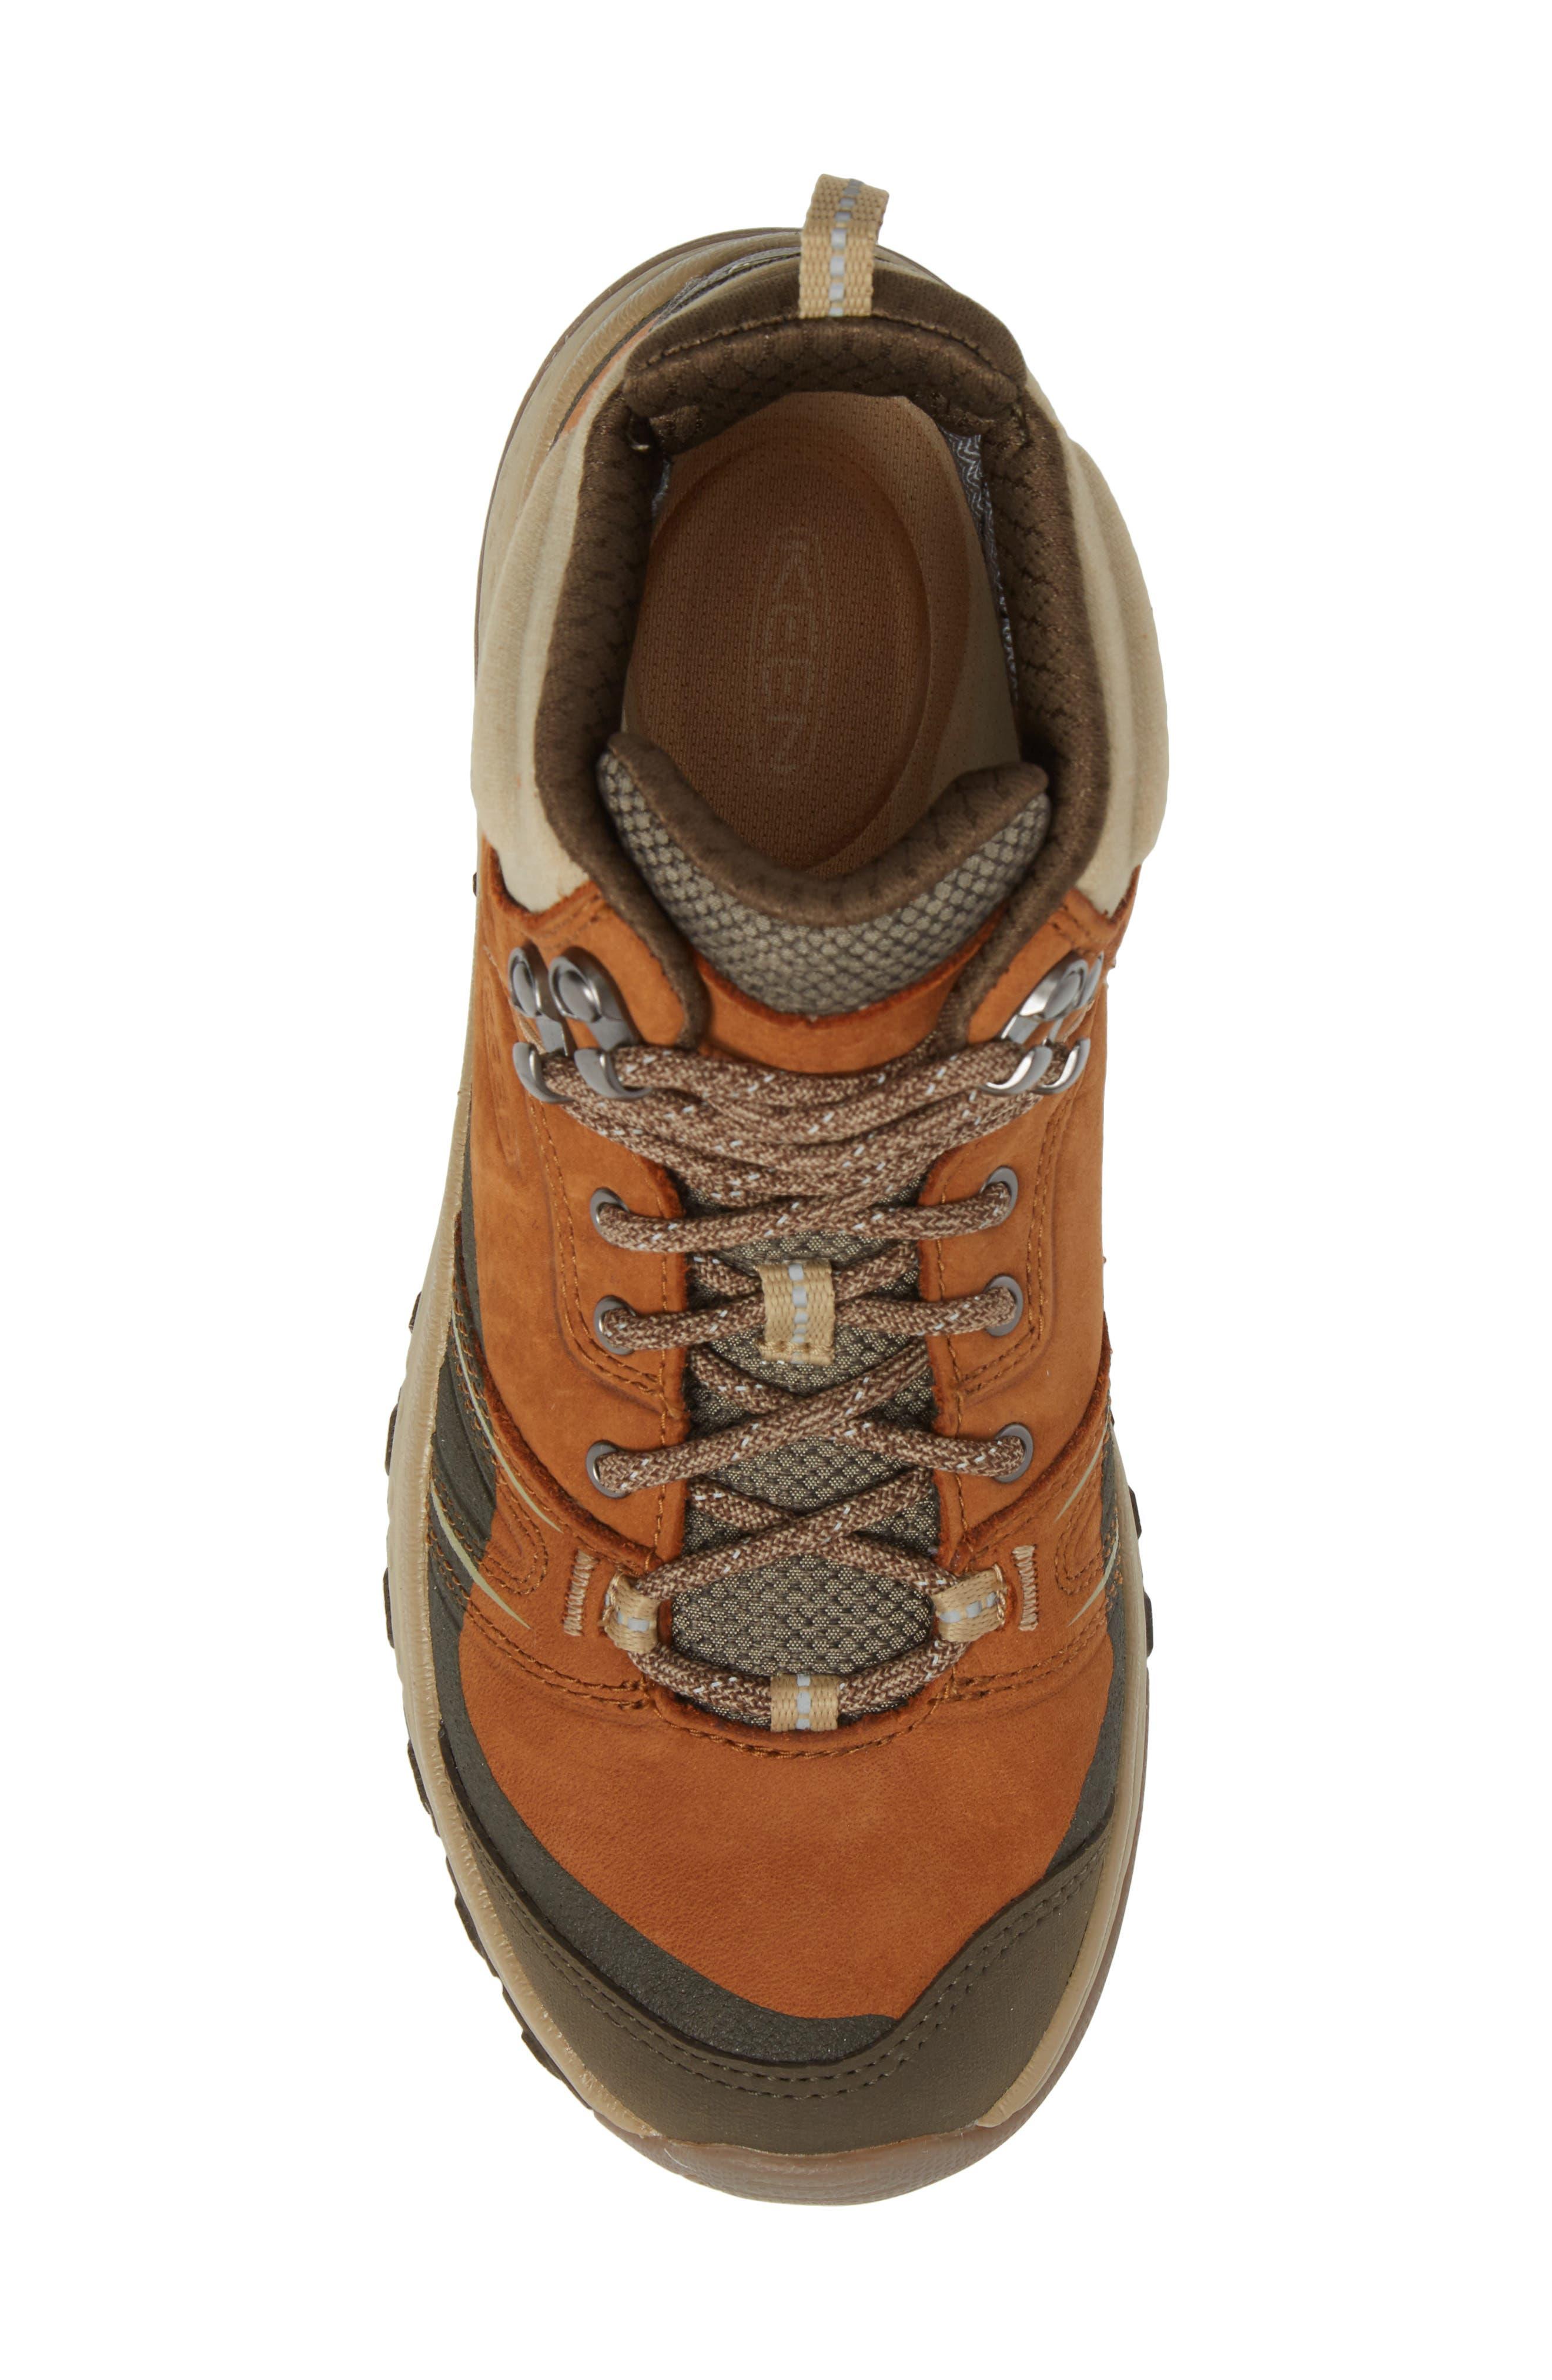 Terradora Leather Waterproof Hiking Boot,                             Alternate thumbnail 5, color,                             TIMBER/ ORANGE NUBUCK